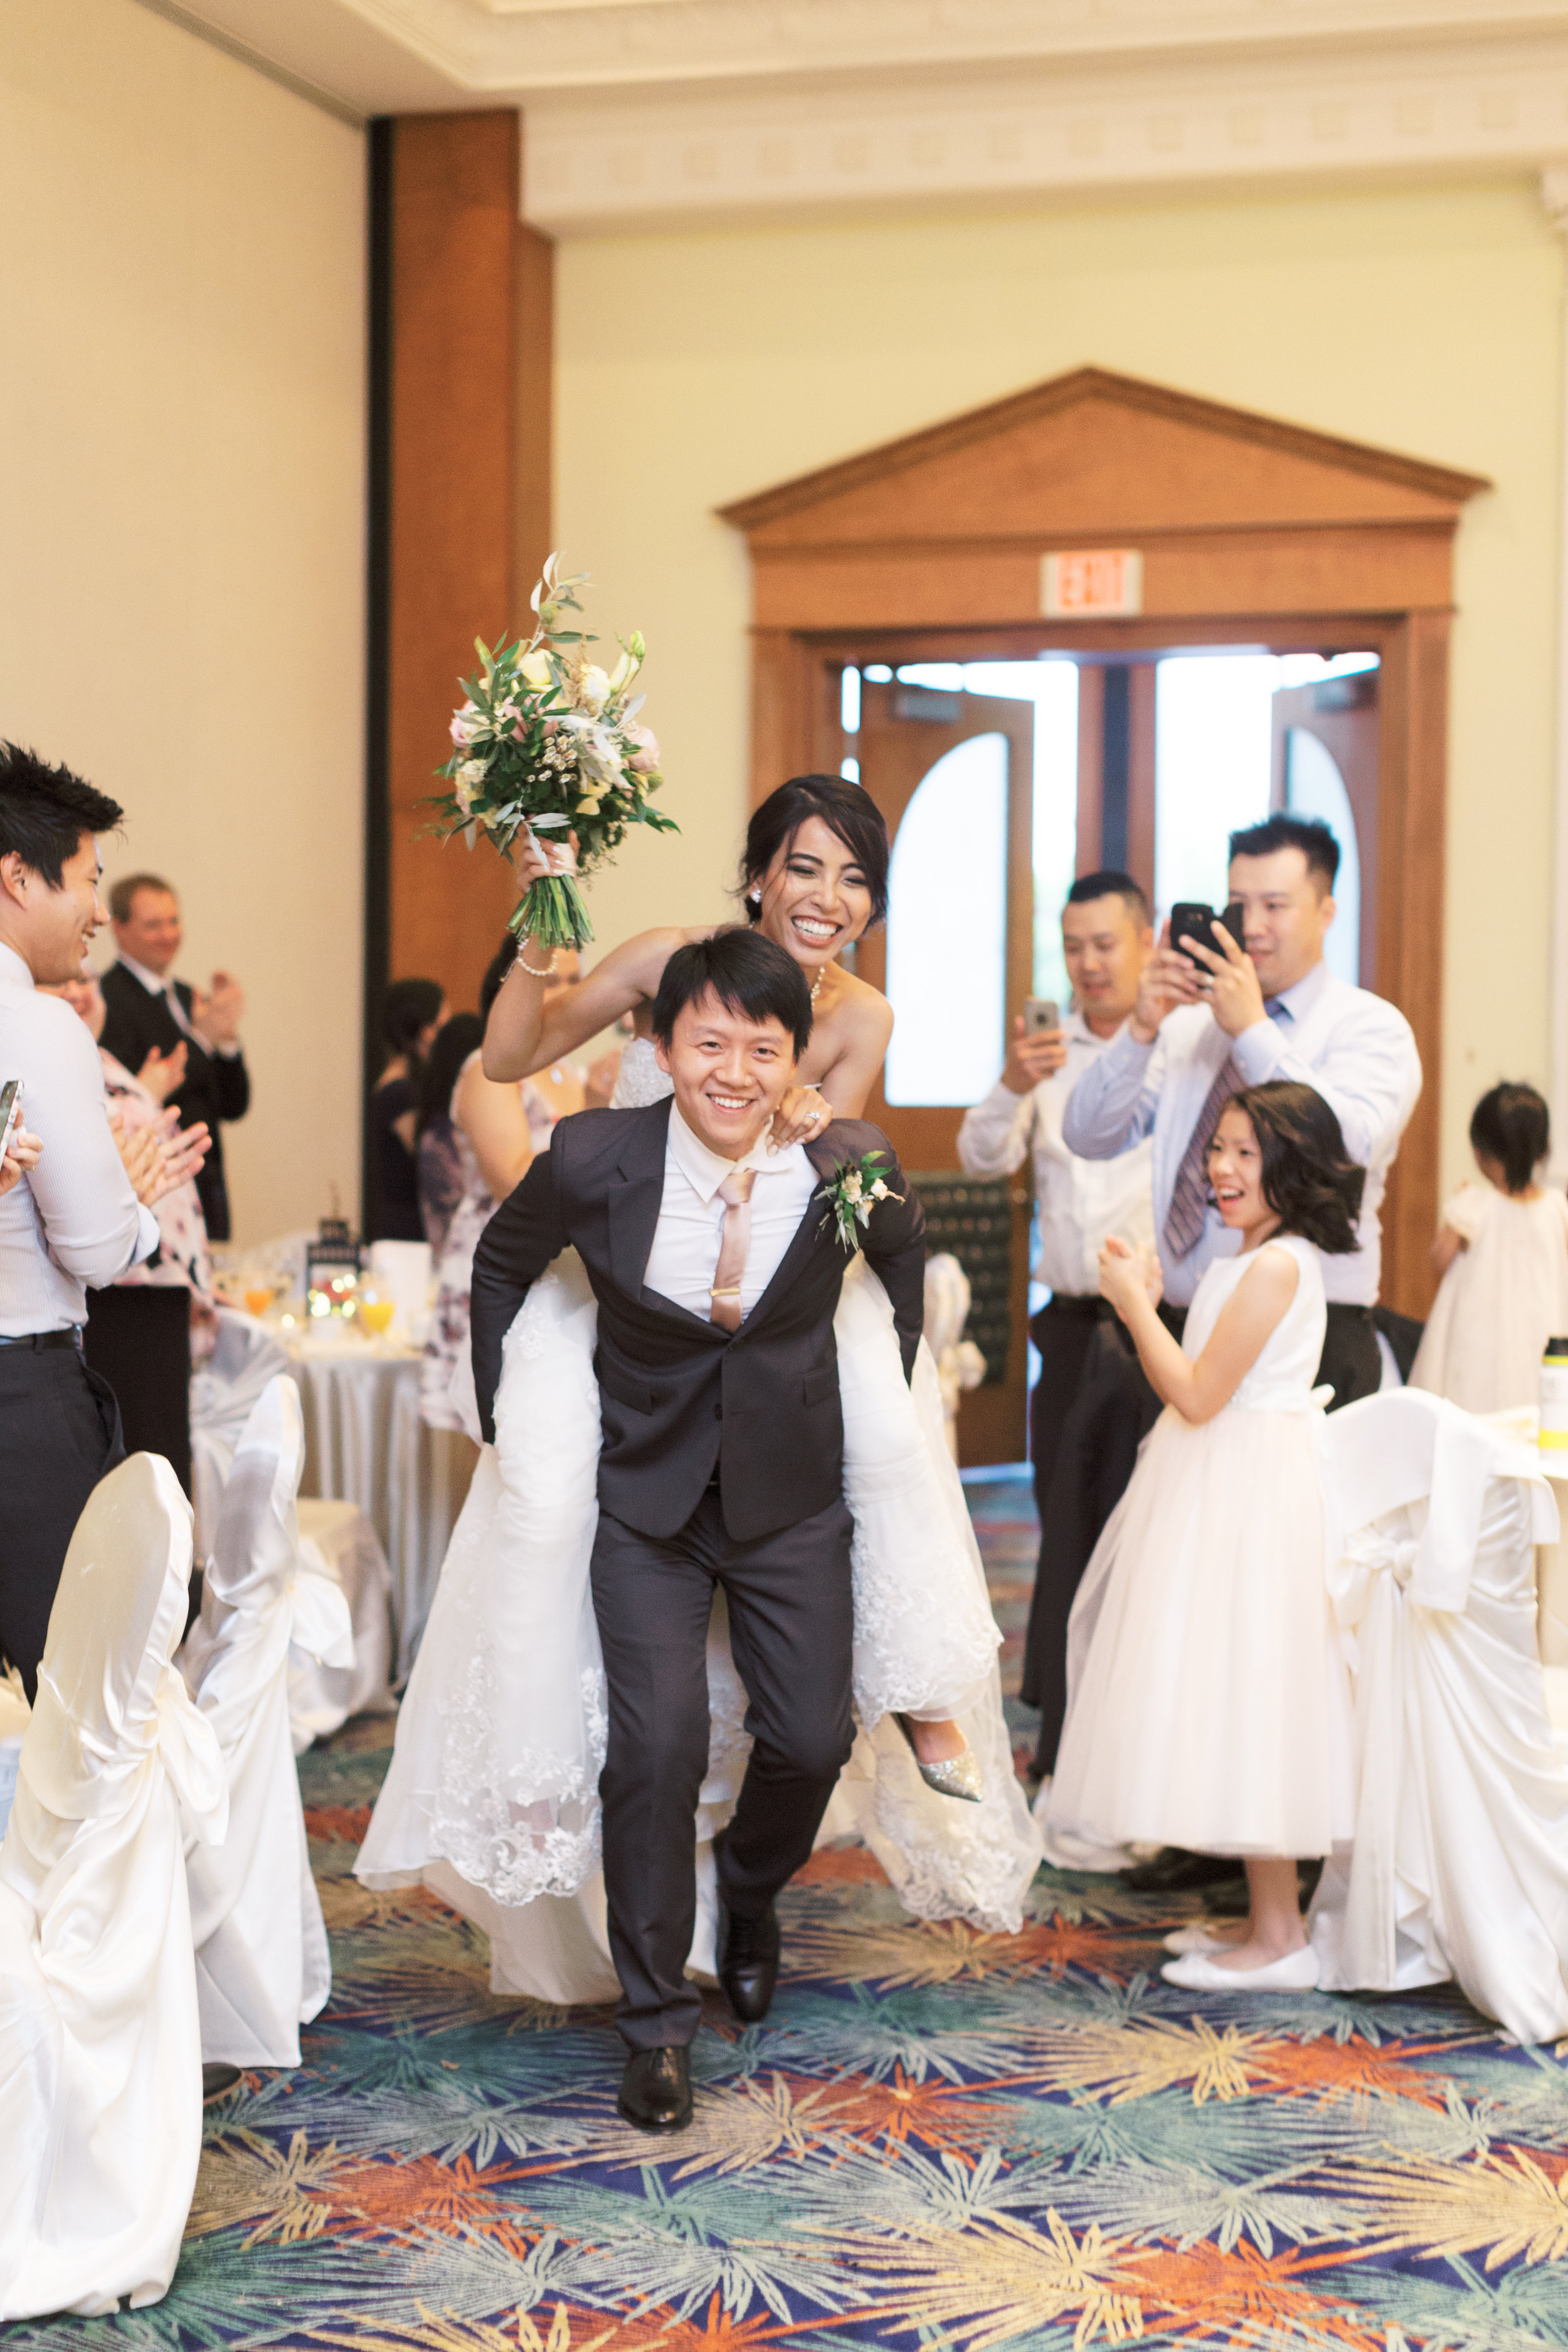 Markham Event Center Wedding-Reception-36.jpg